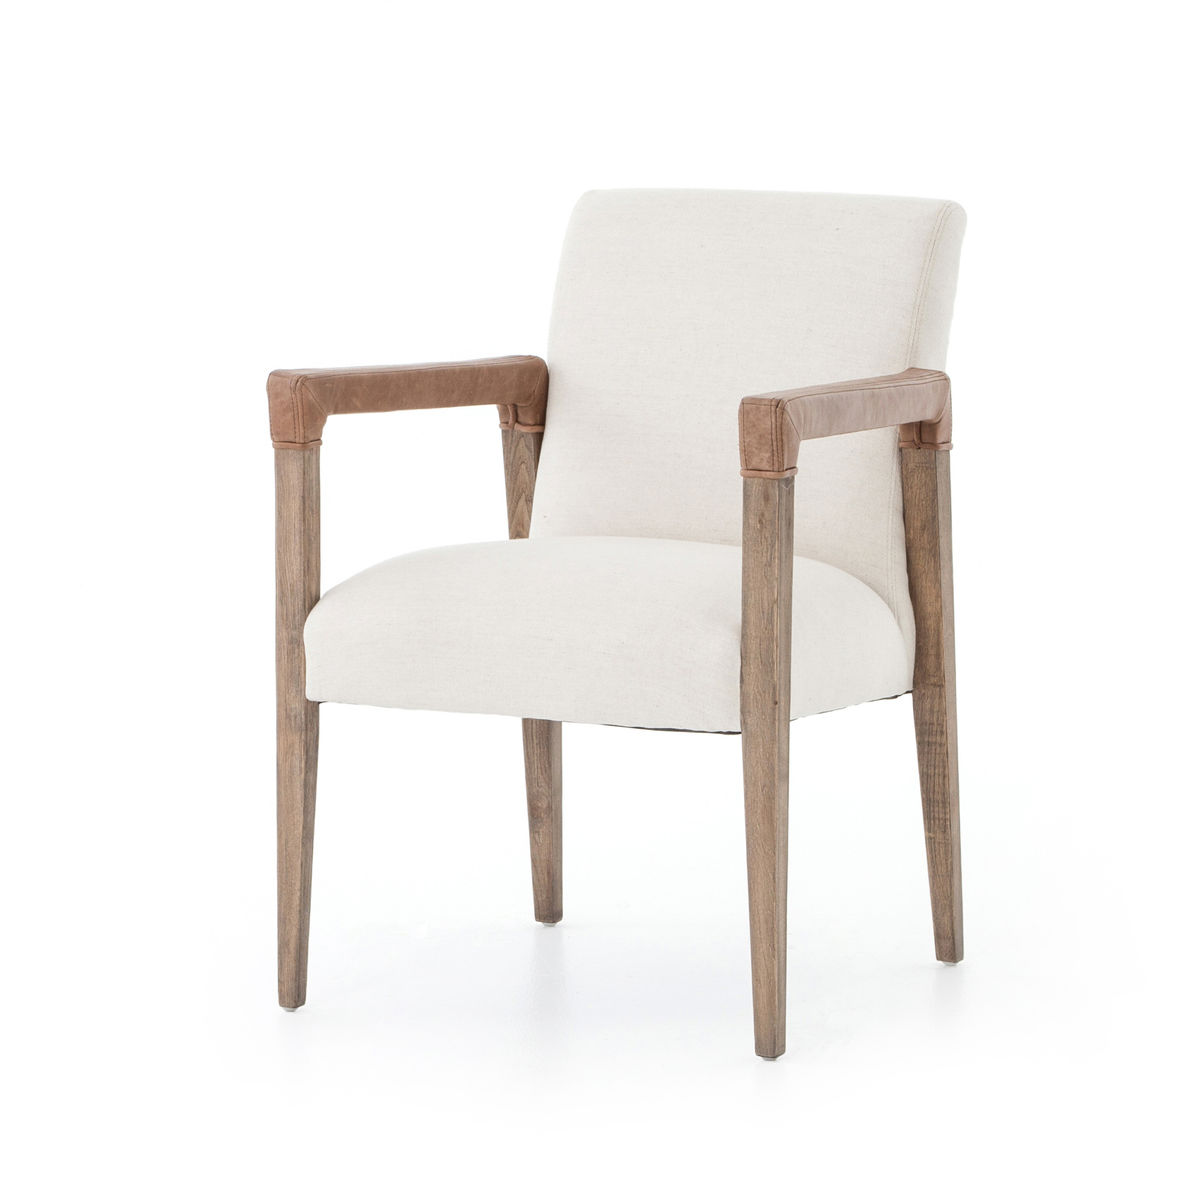 Reuben Dining Chair-Harbor Natural